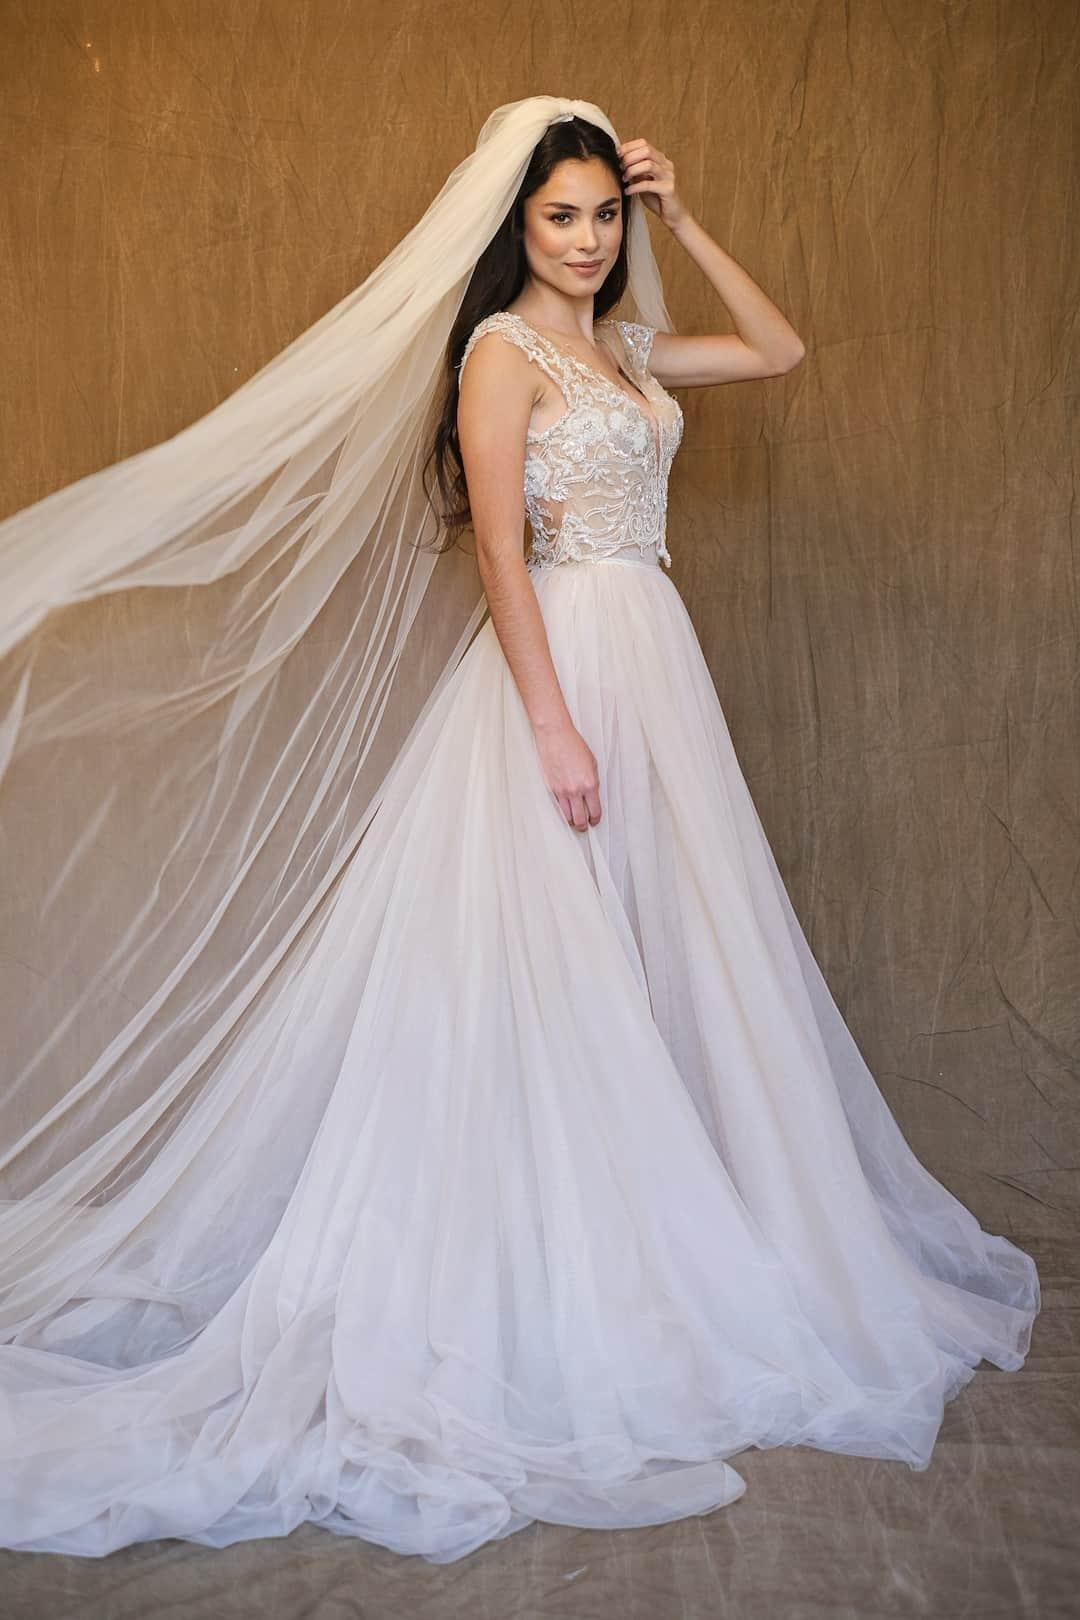 Wedding dresses on sale in Bratislava - Galia Lahav - Gala 607 - front